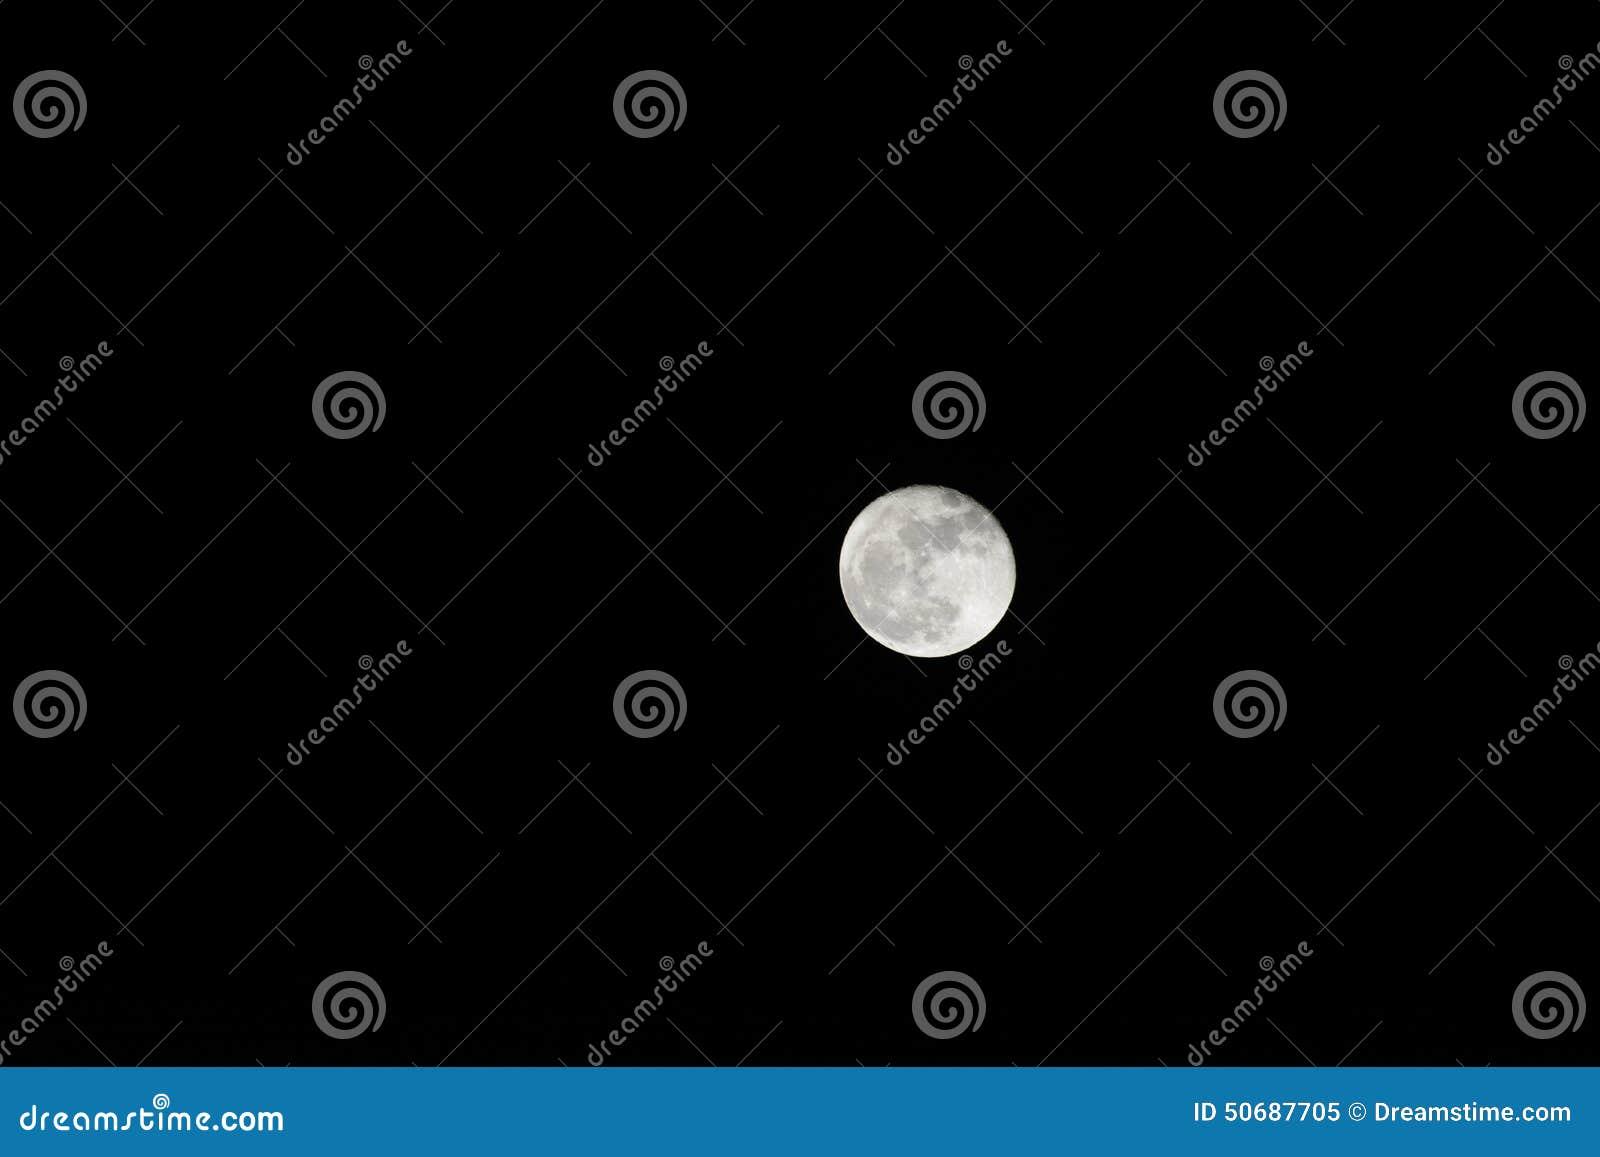 Download 美丽的月亮 库存图片. 图片 包括有 几小时, 顶层, 减少, beauvoir, 月亮, 放松, 方式 - 50687705